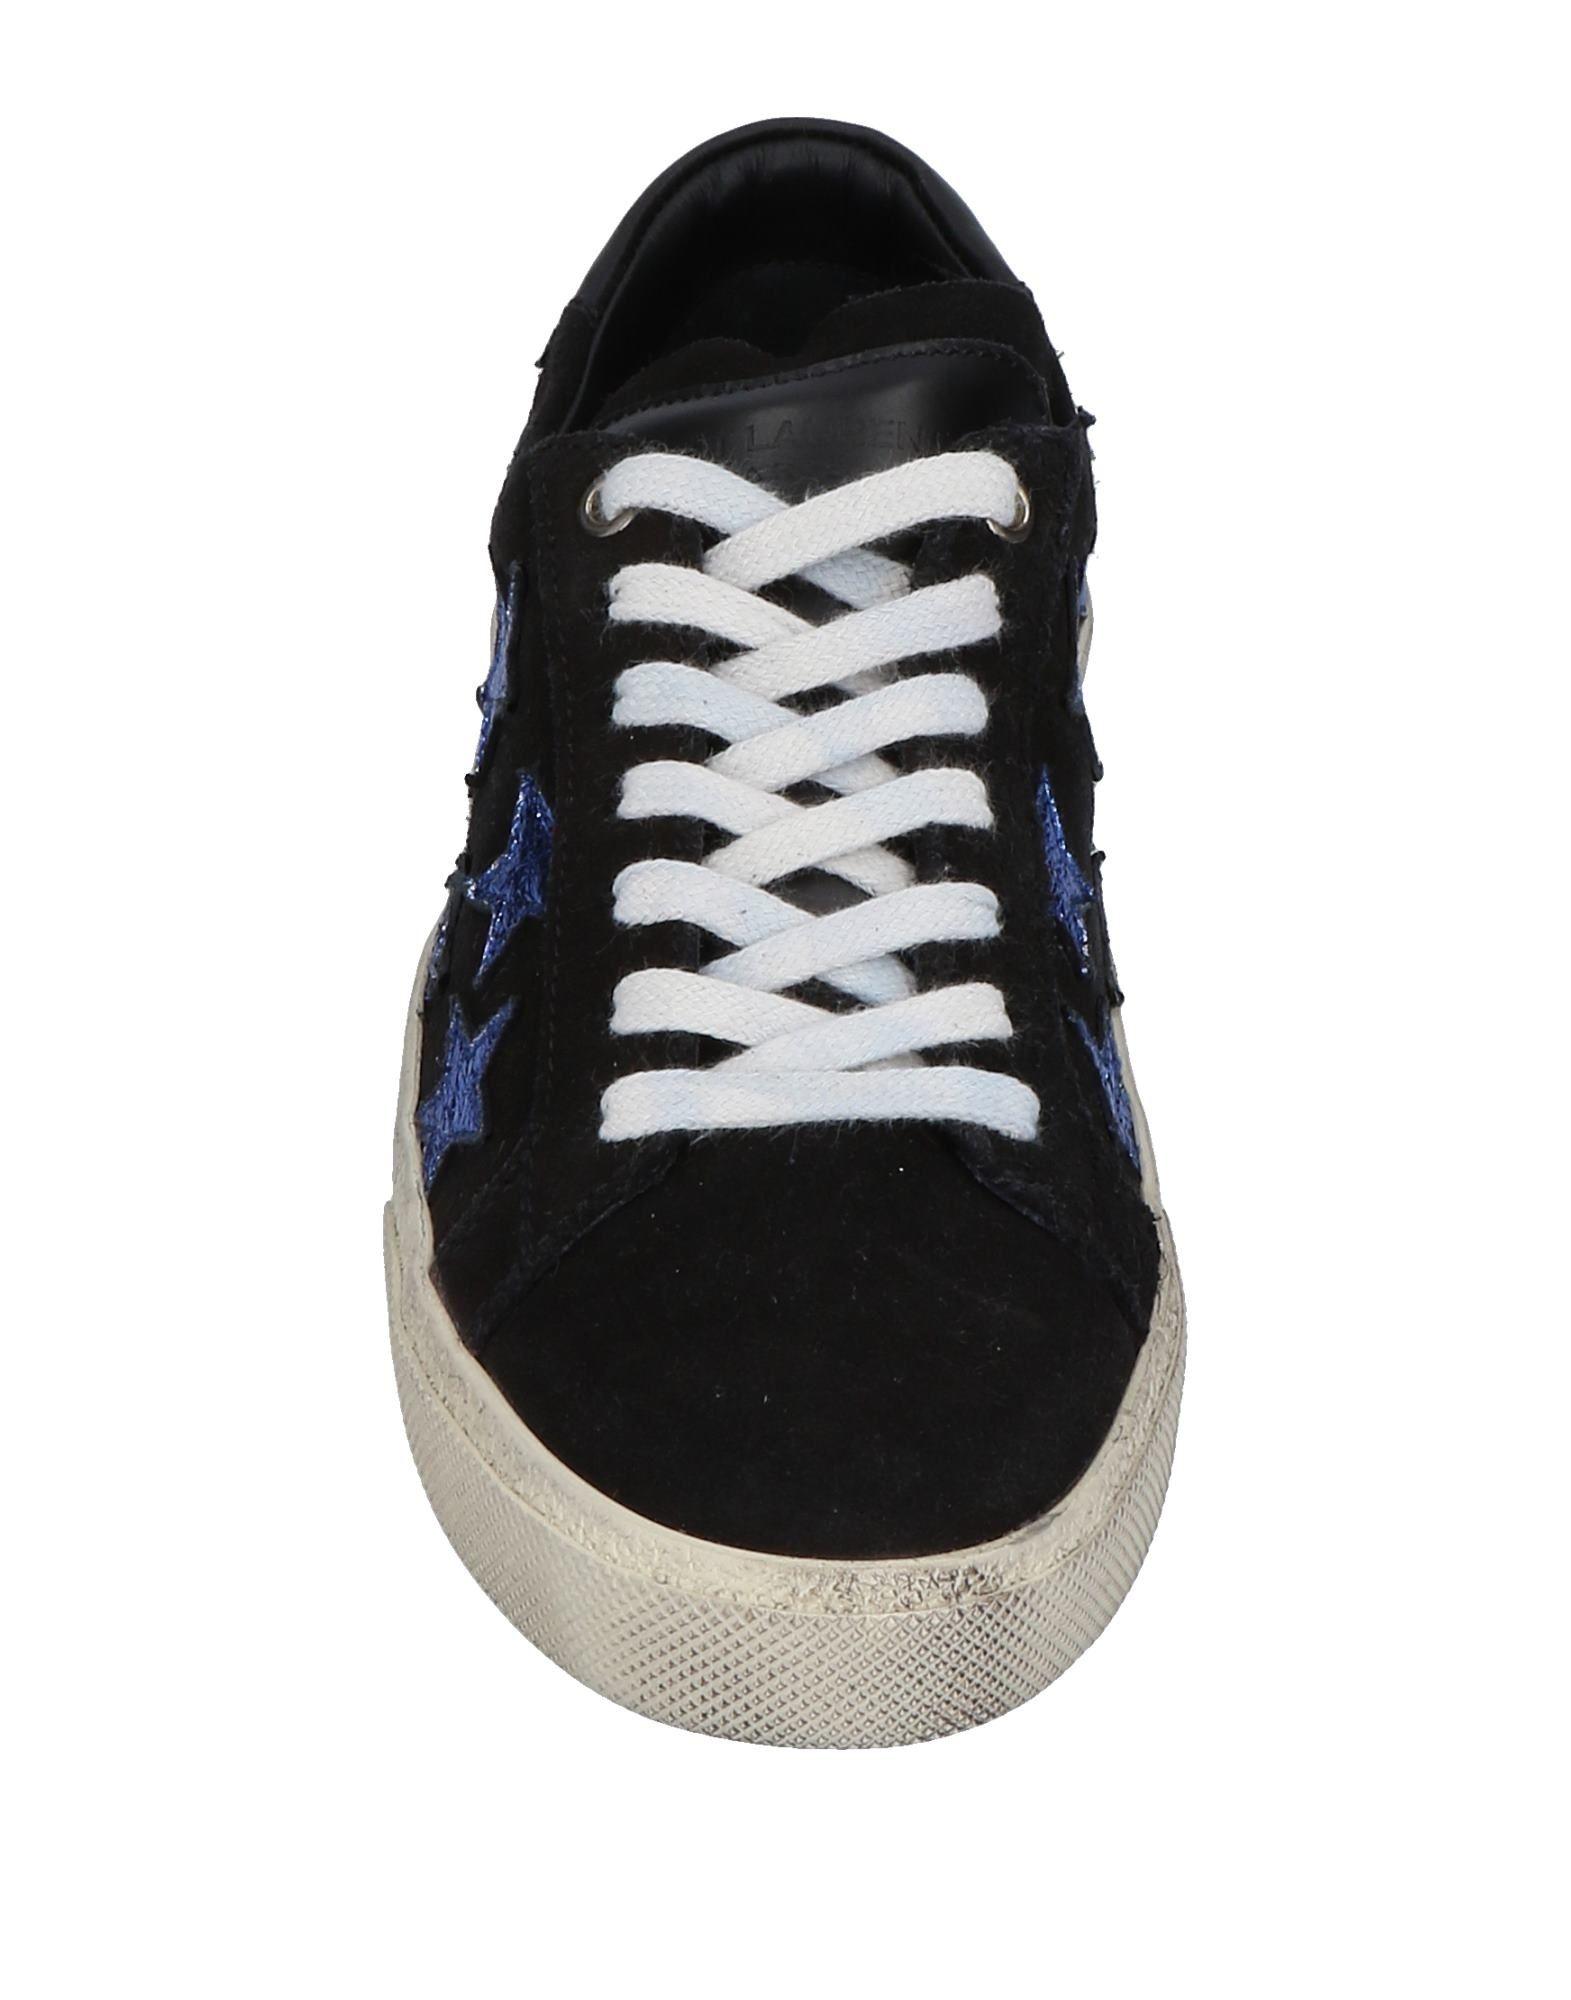 Rabatt Damen Schuhe Saint Laurent Sneakers Damen Rabatt  11502751WC 154d5a